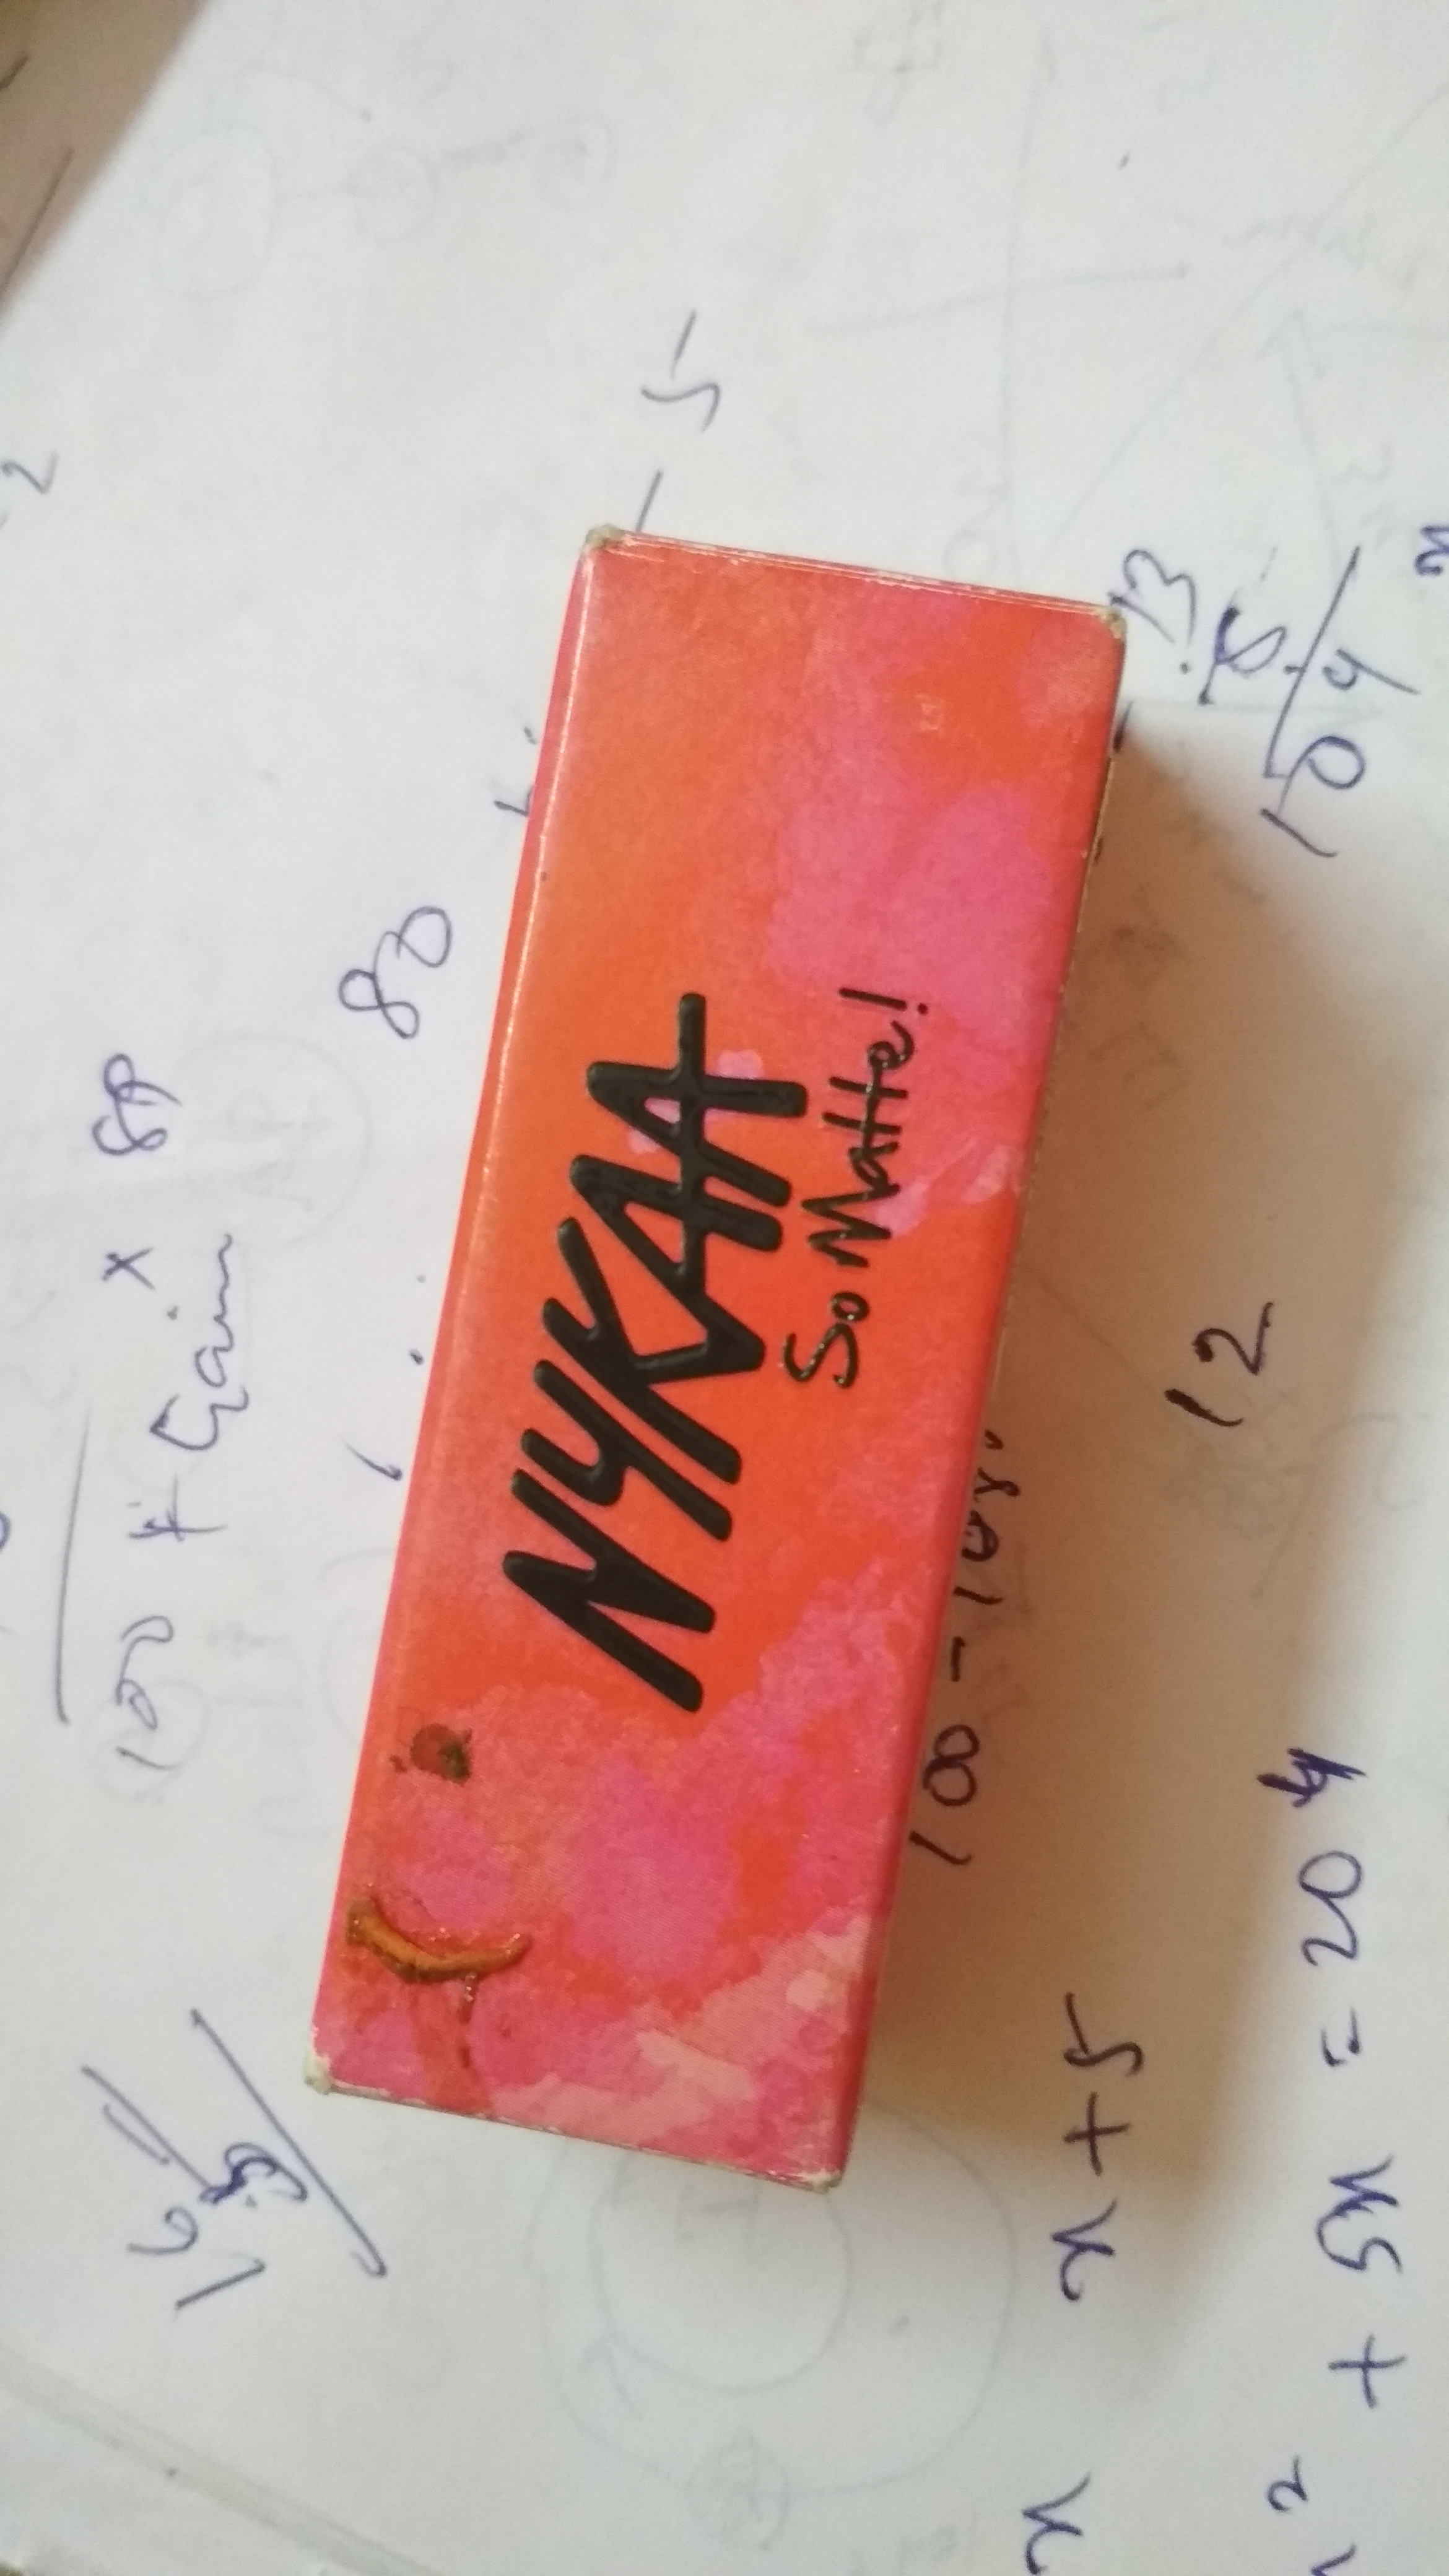 Nykaa So Matte Lipstick-Nykaa so matte-By mitshu98-2